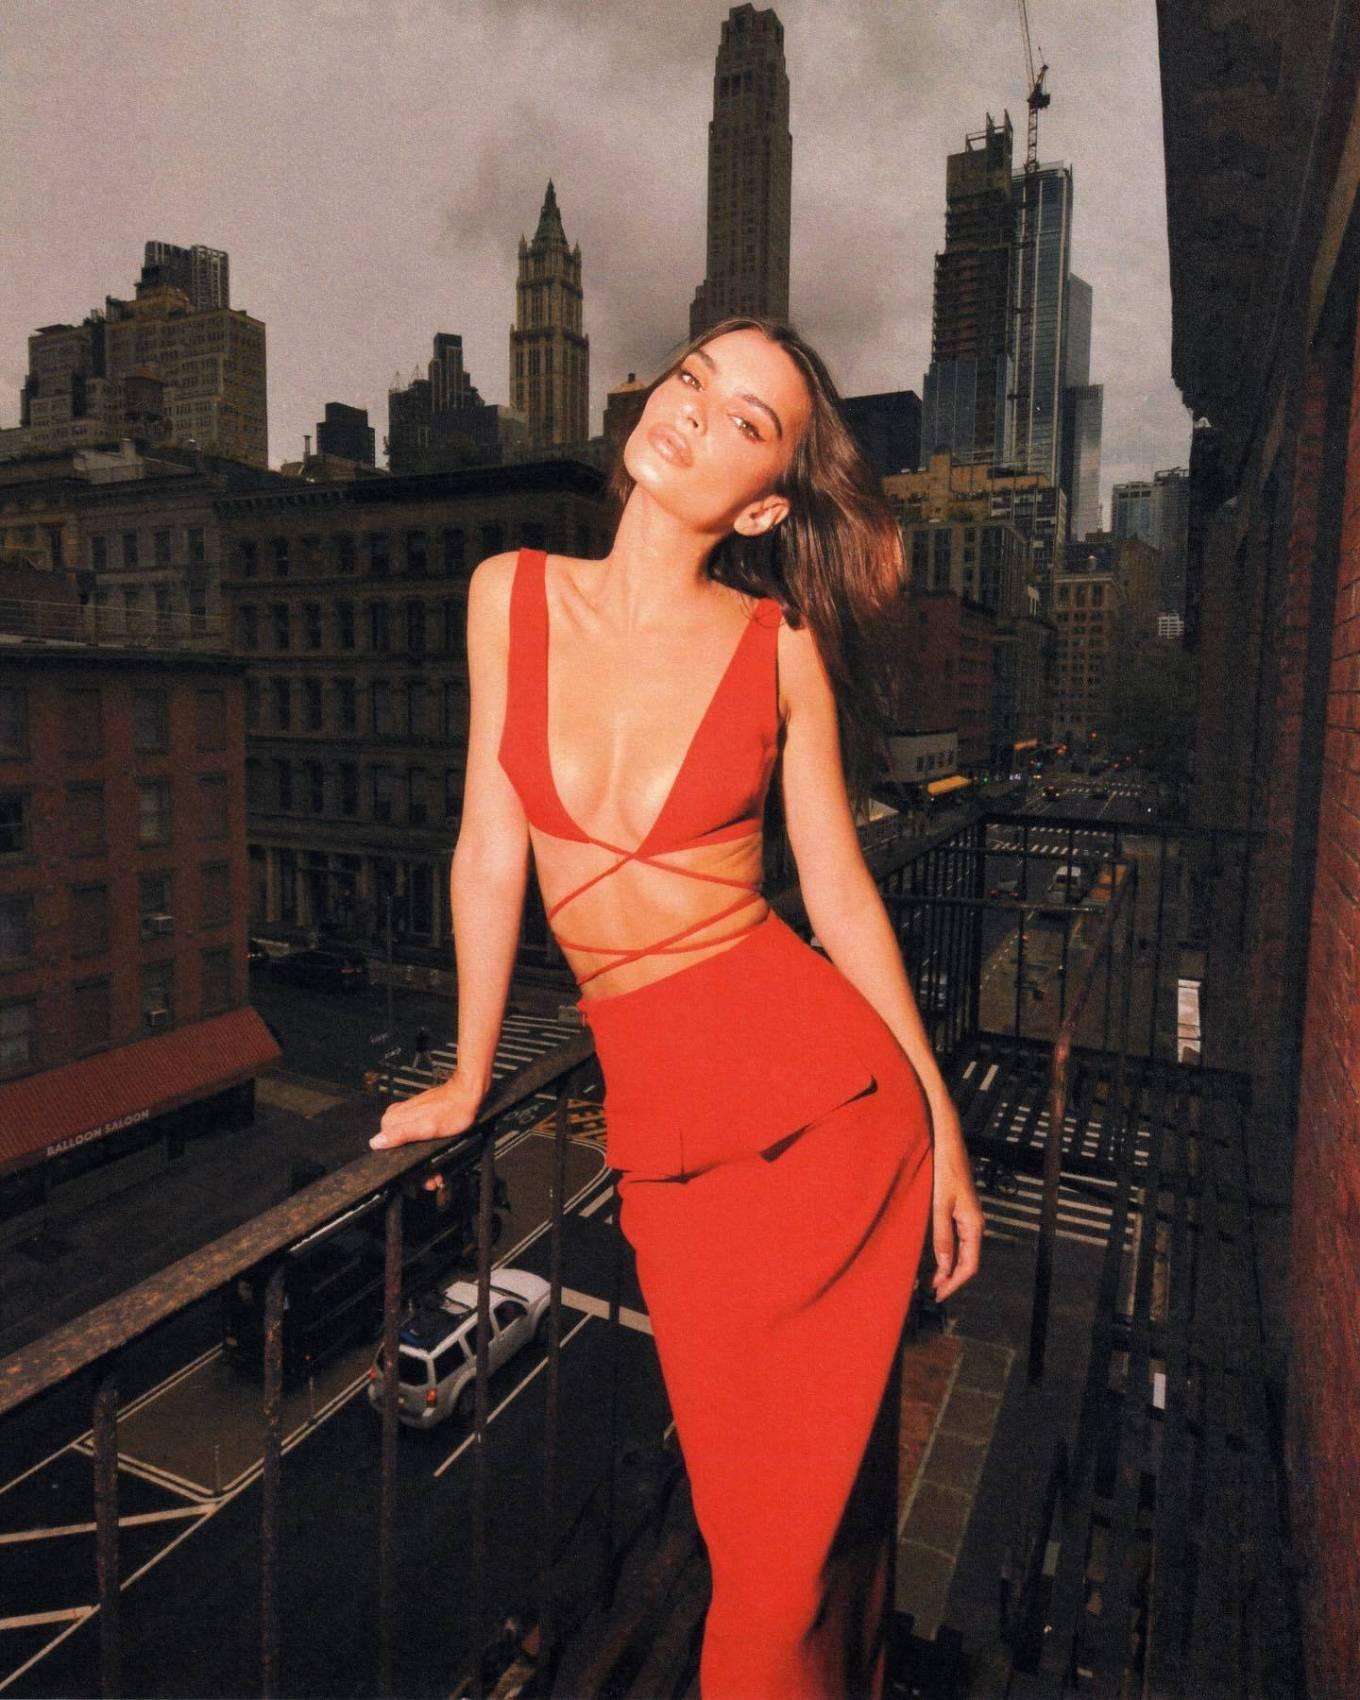 Emily Ratajkowski donning a red figure hugging matchstick skirt